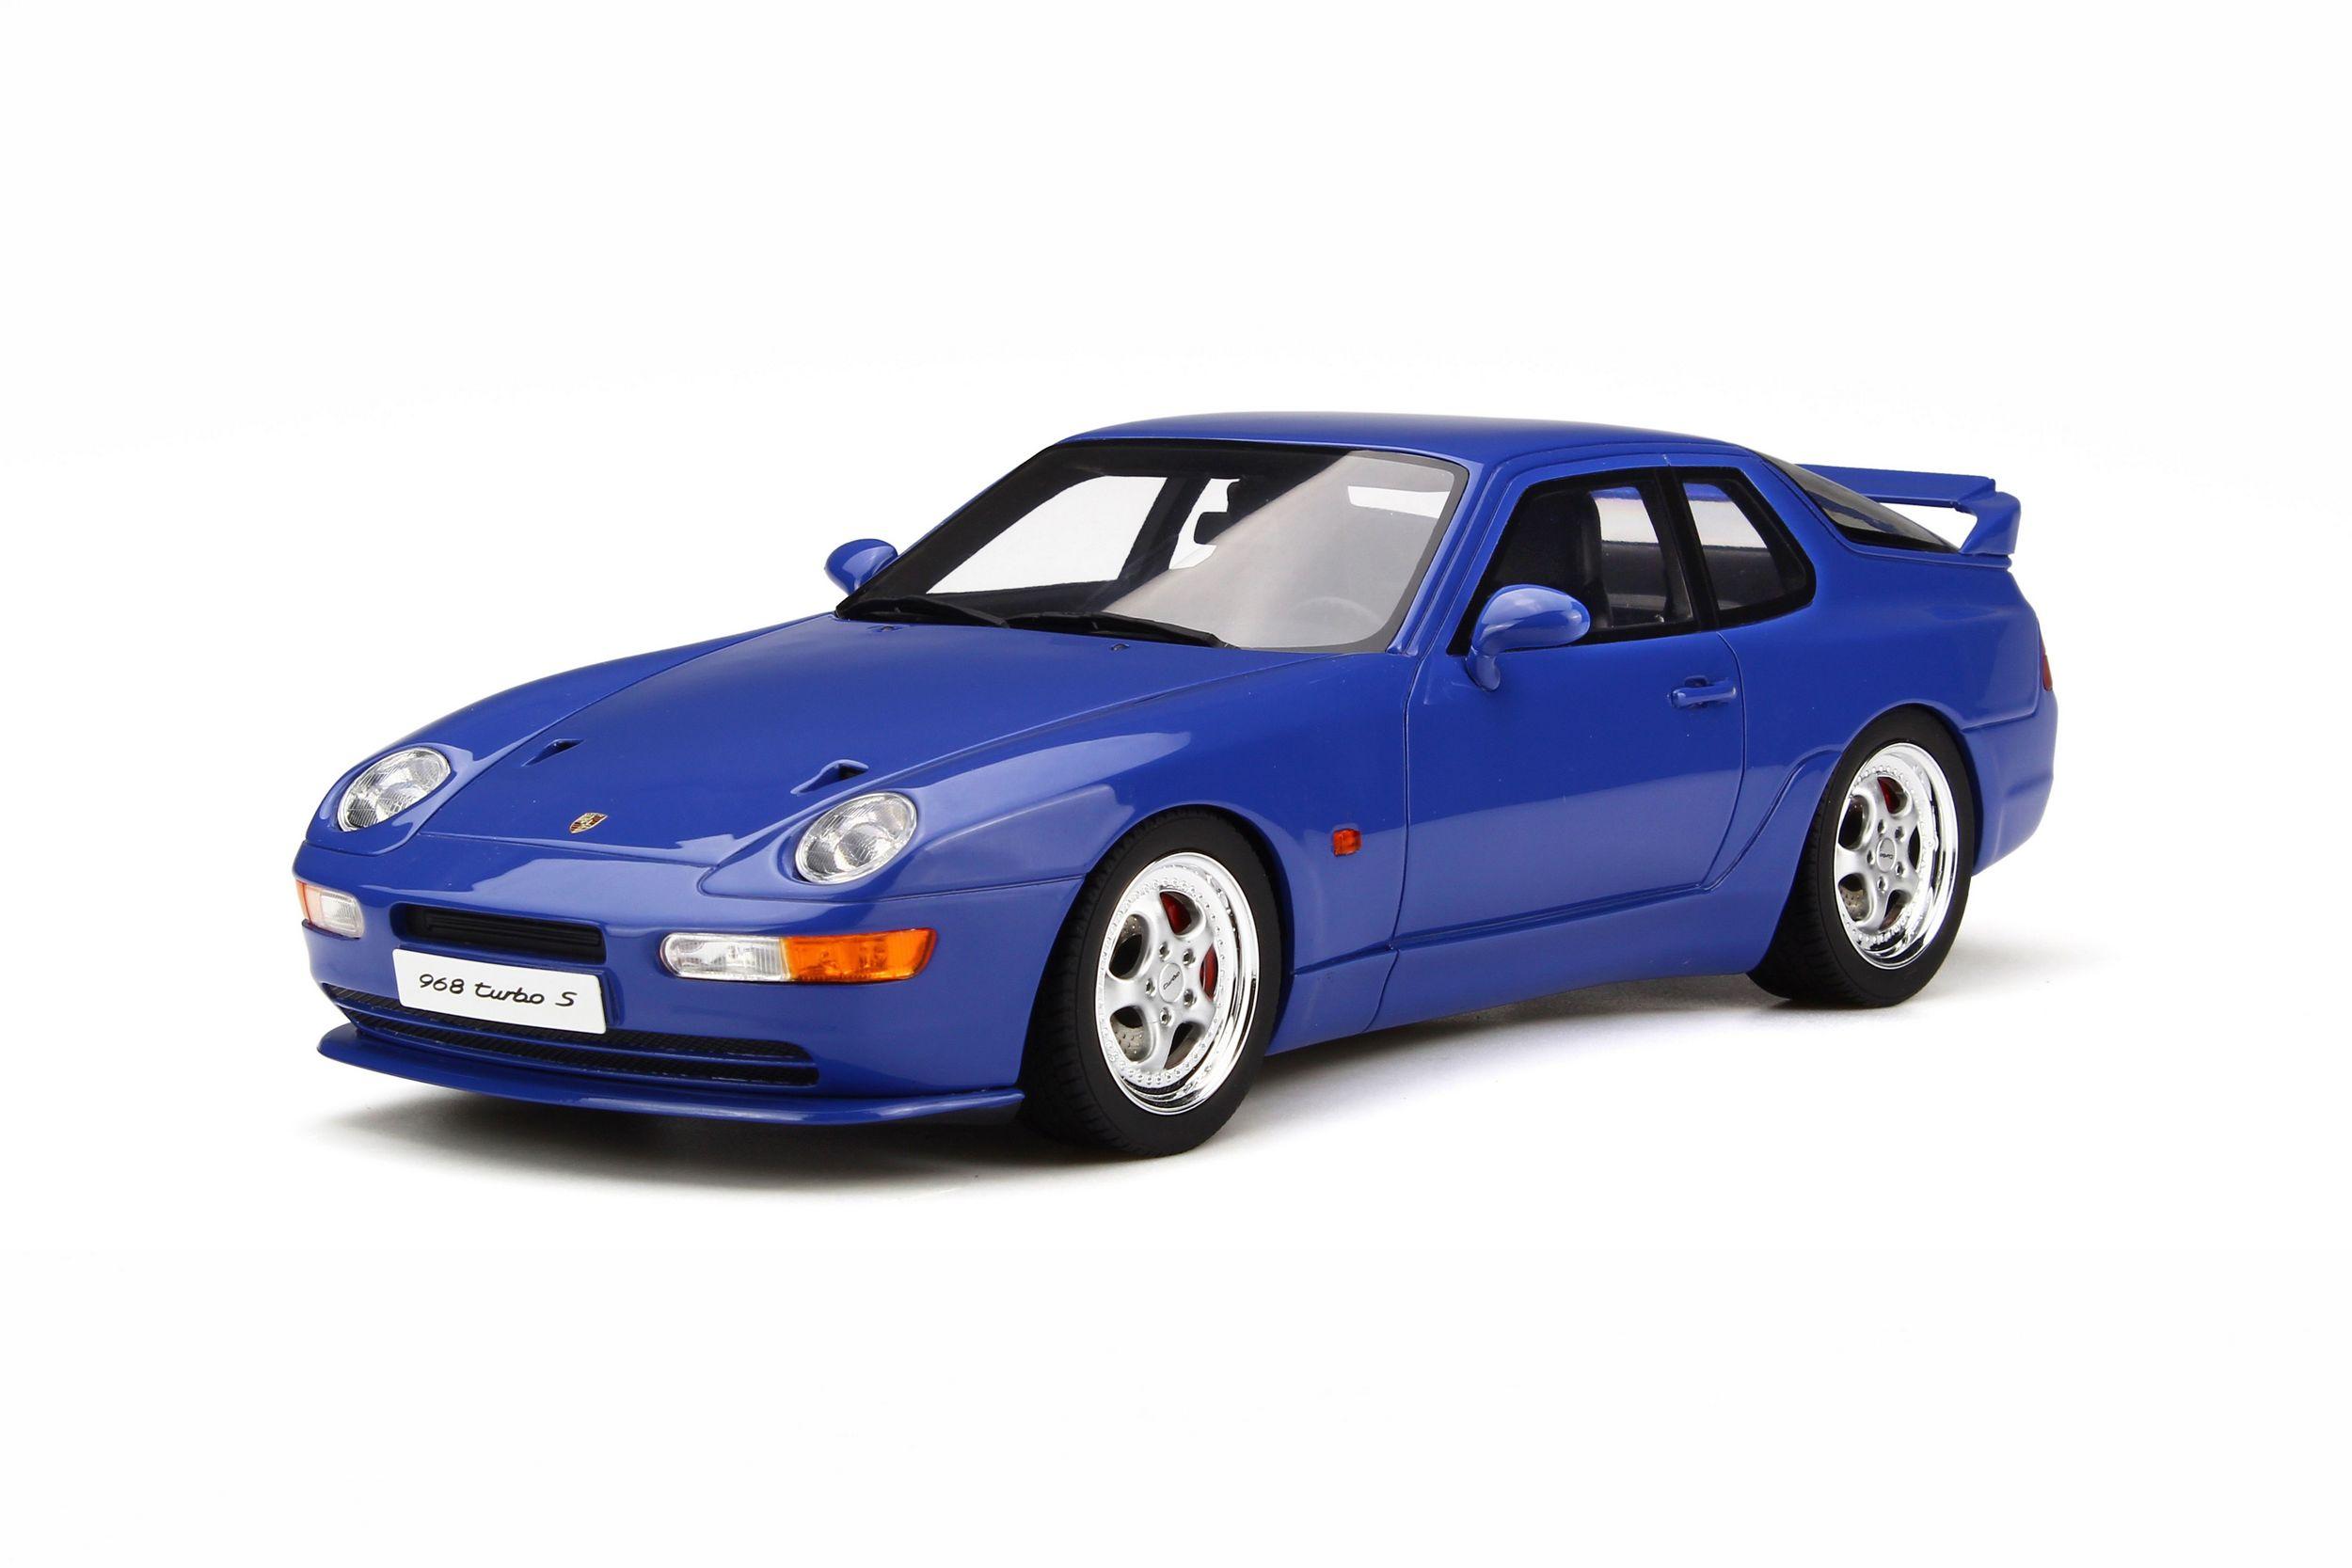 Porsche 968 Turbo S